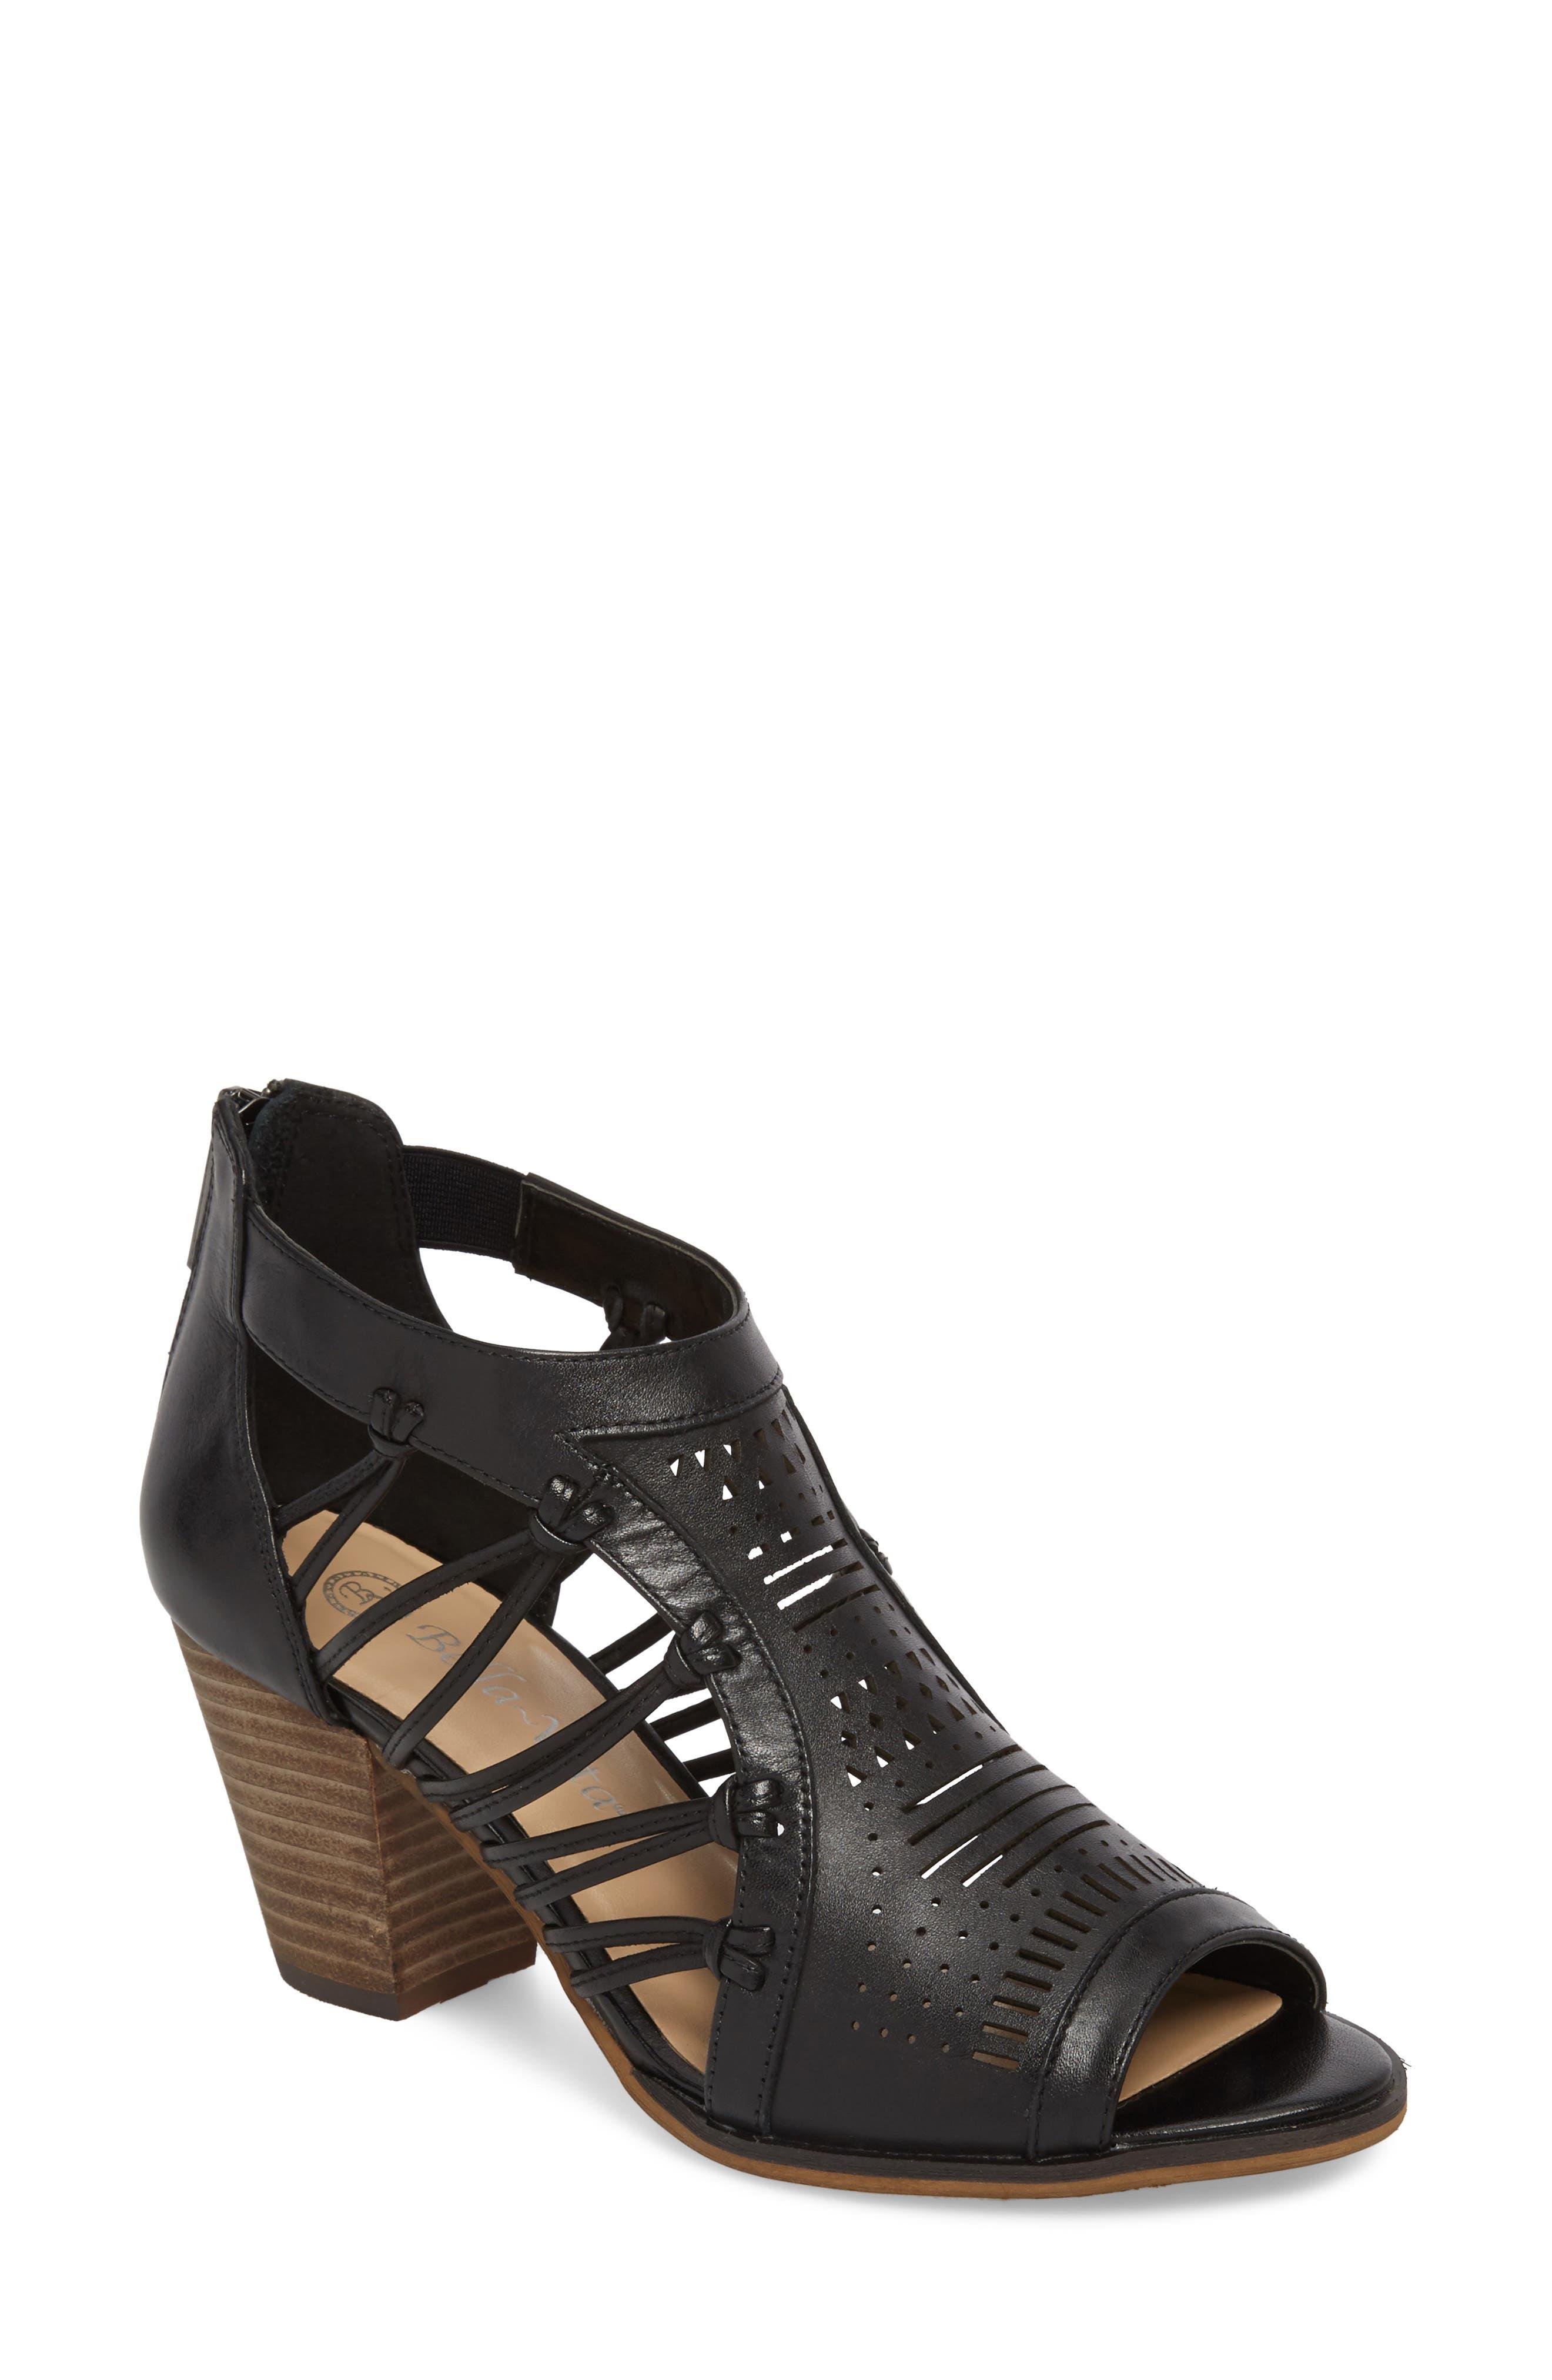 Kortez Block Heel Sandal,                             Main thumbnail 1, color,                             BLACK LEATHER